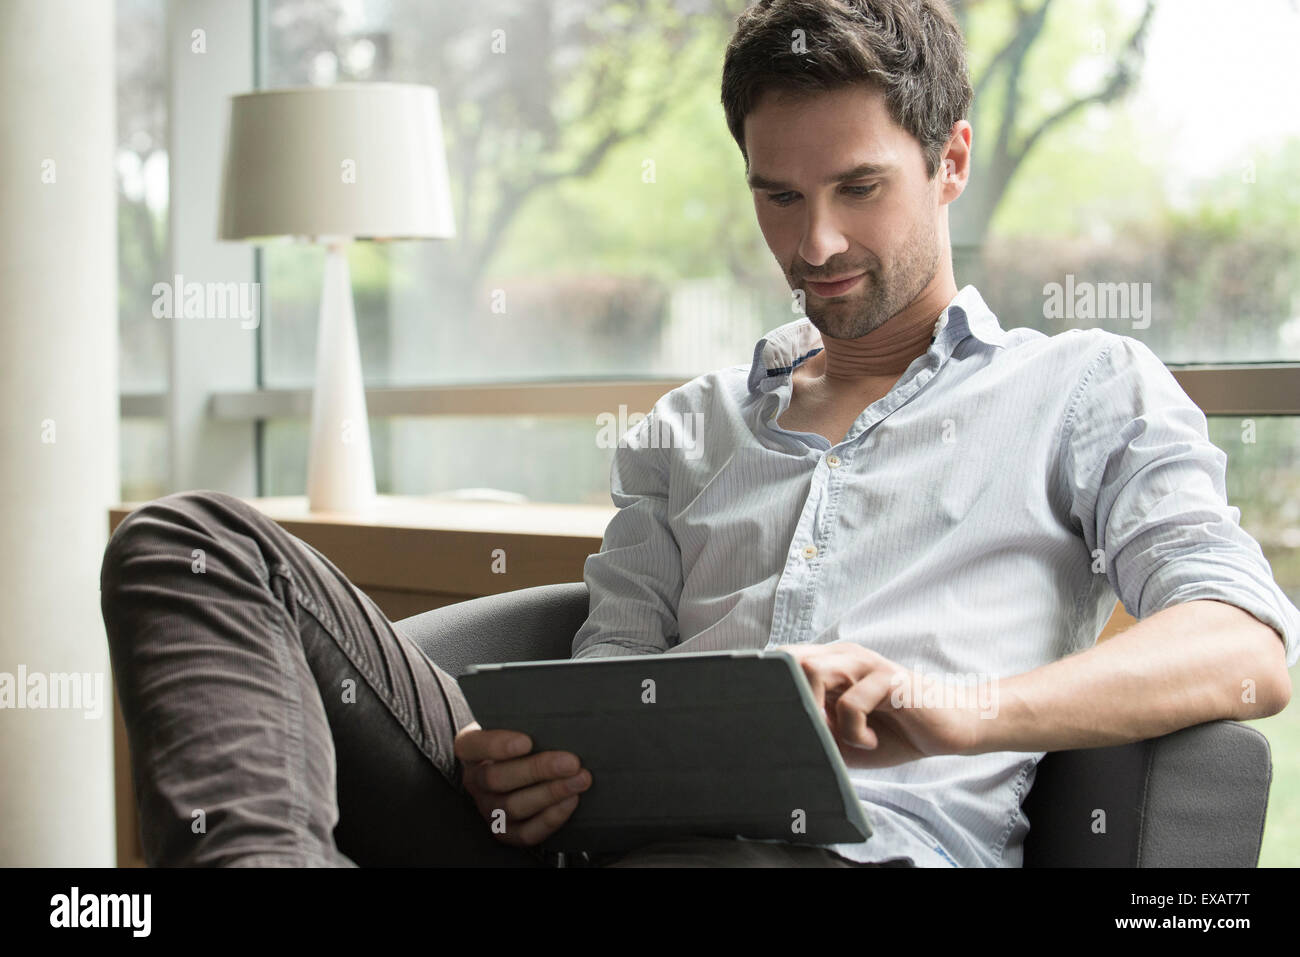 Man using digital tablet at home - Stock Image